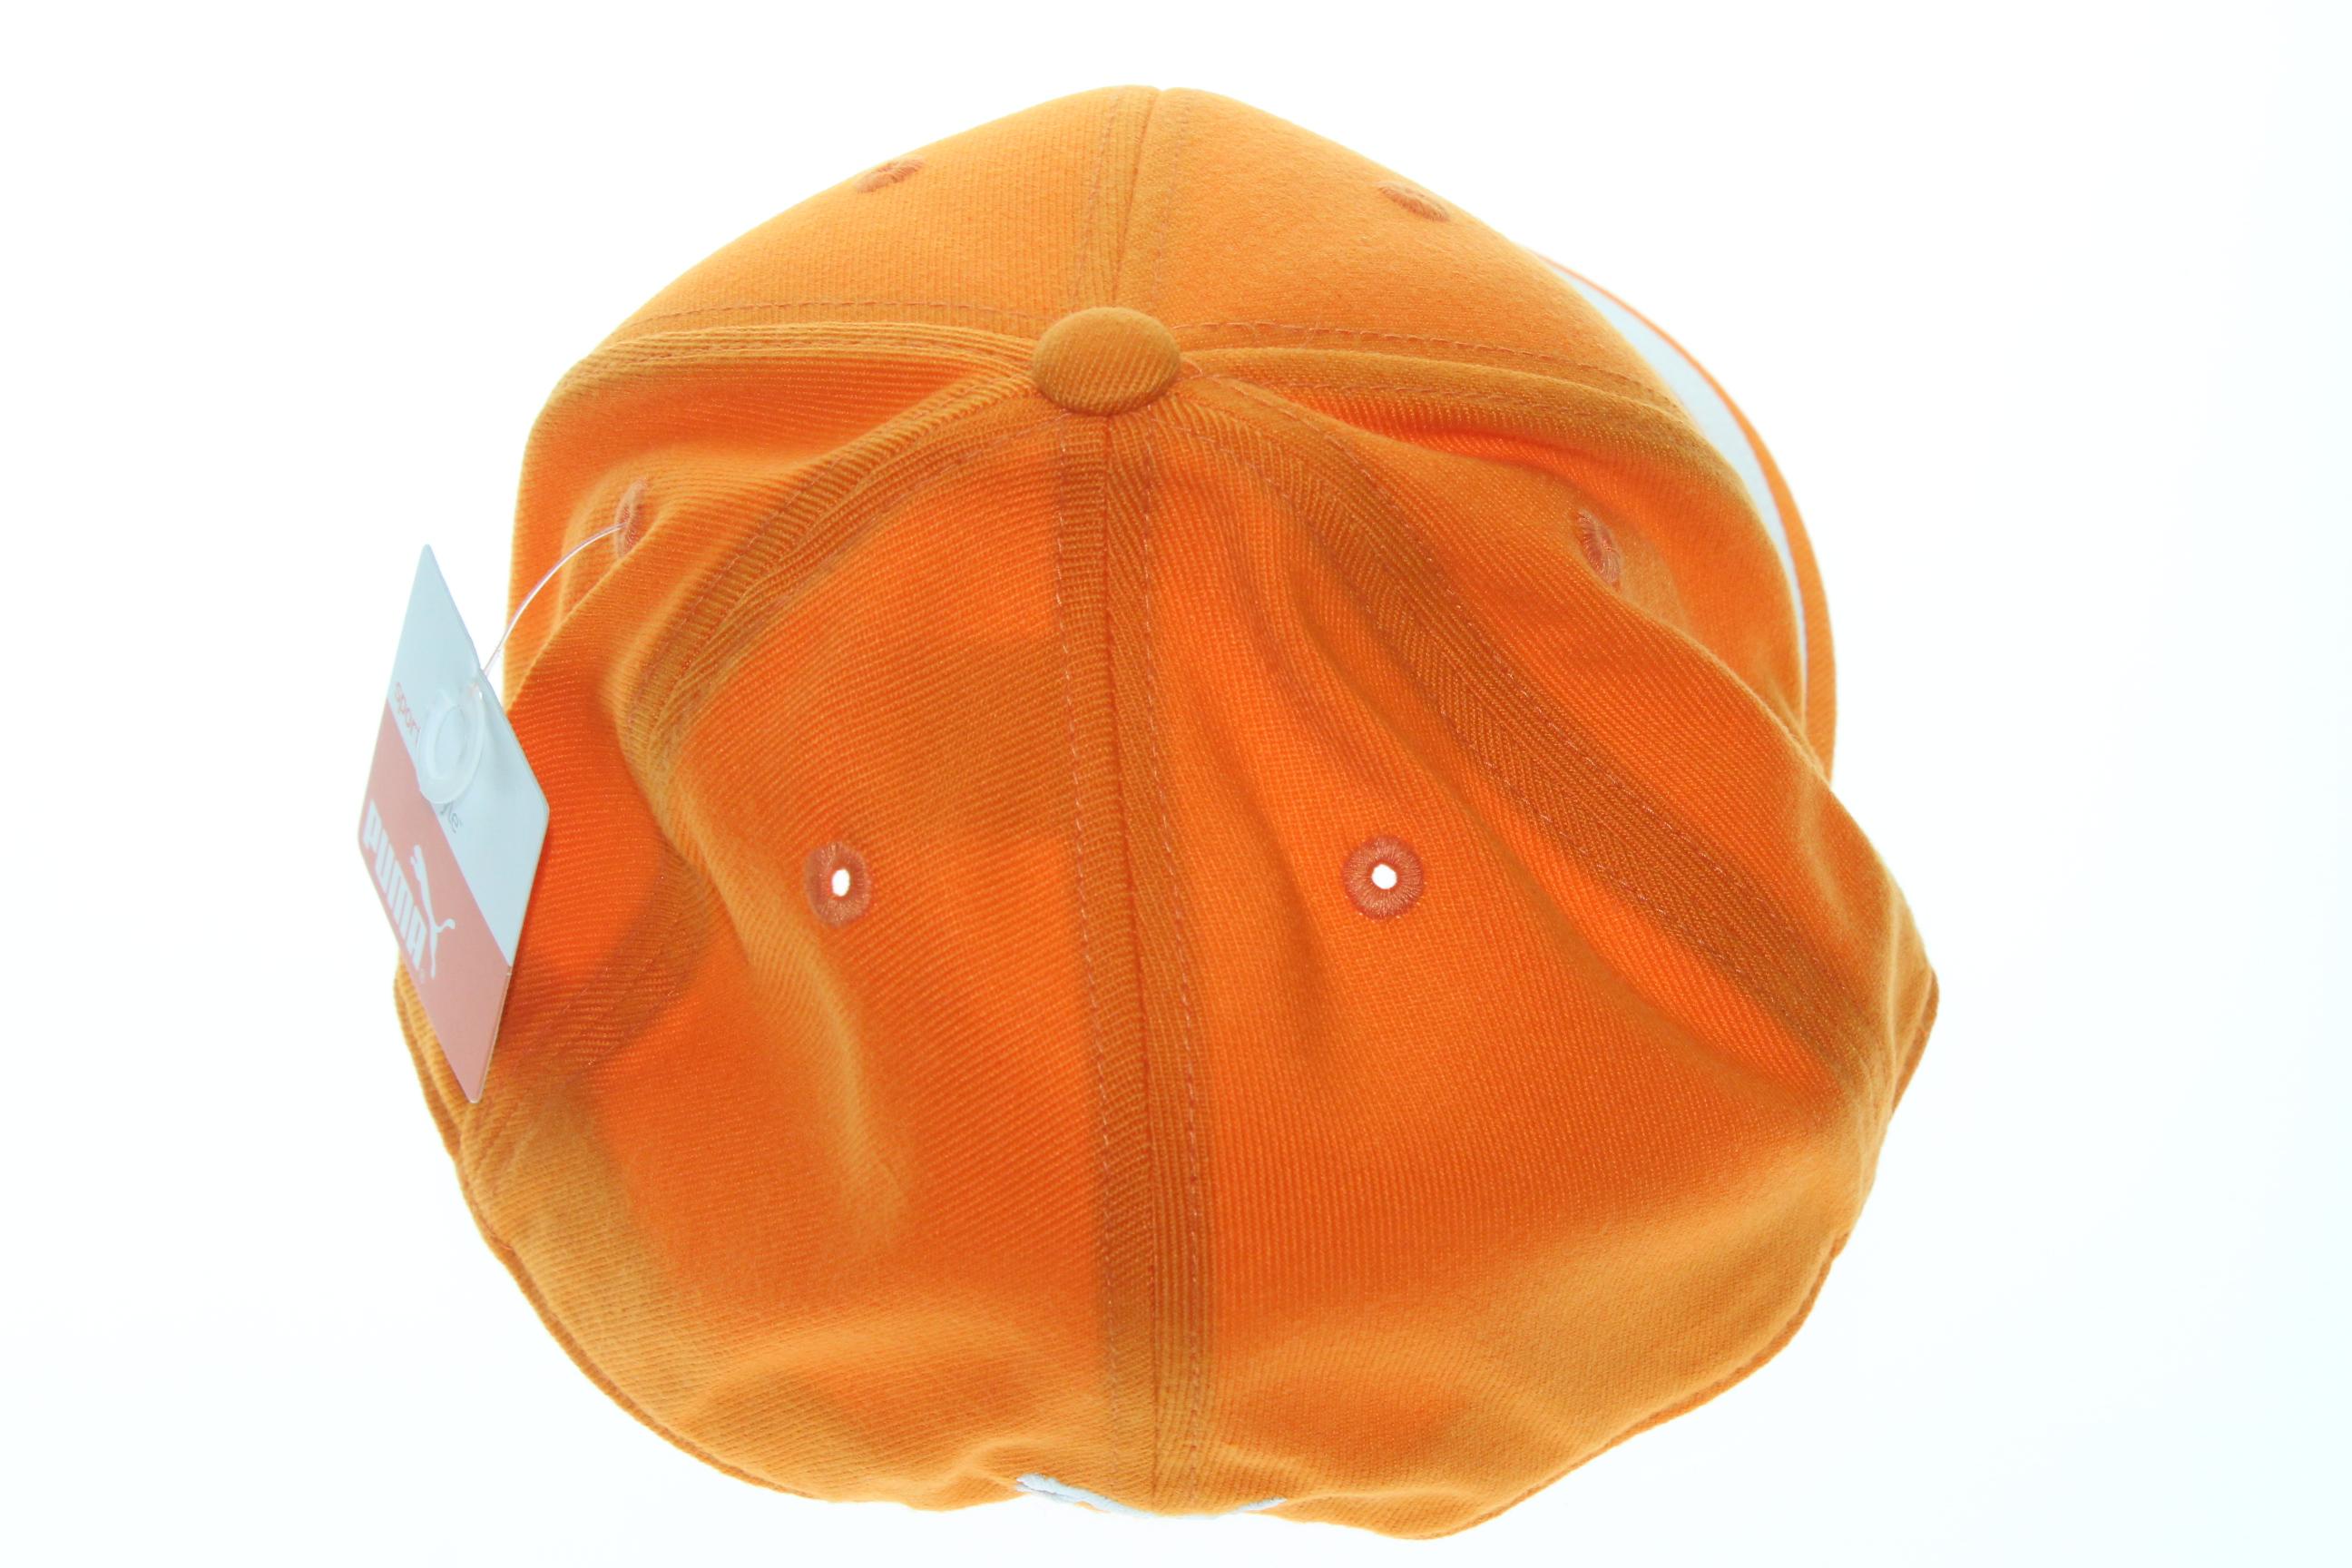 449dafe7083 spain orange puma hat rickie fowler 11a98 957fe